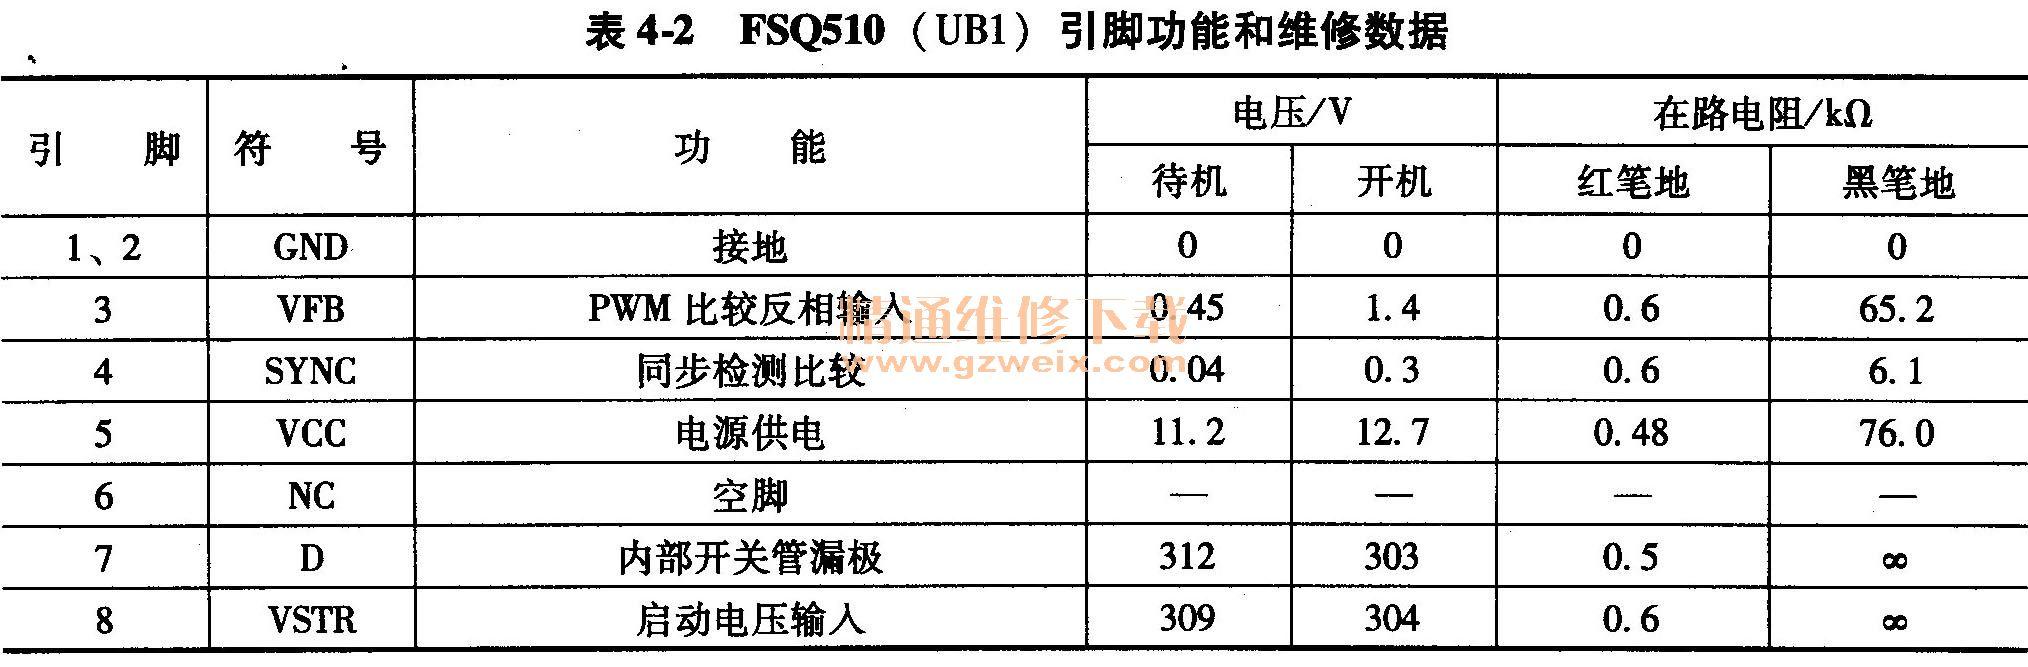 FSQ510 (UB1 )引脚功能和维修数据